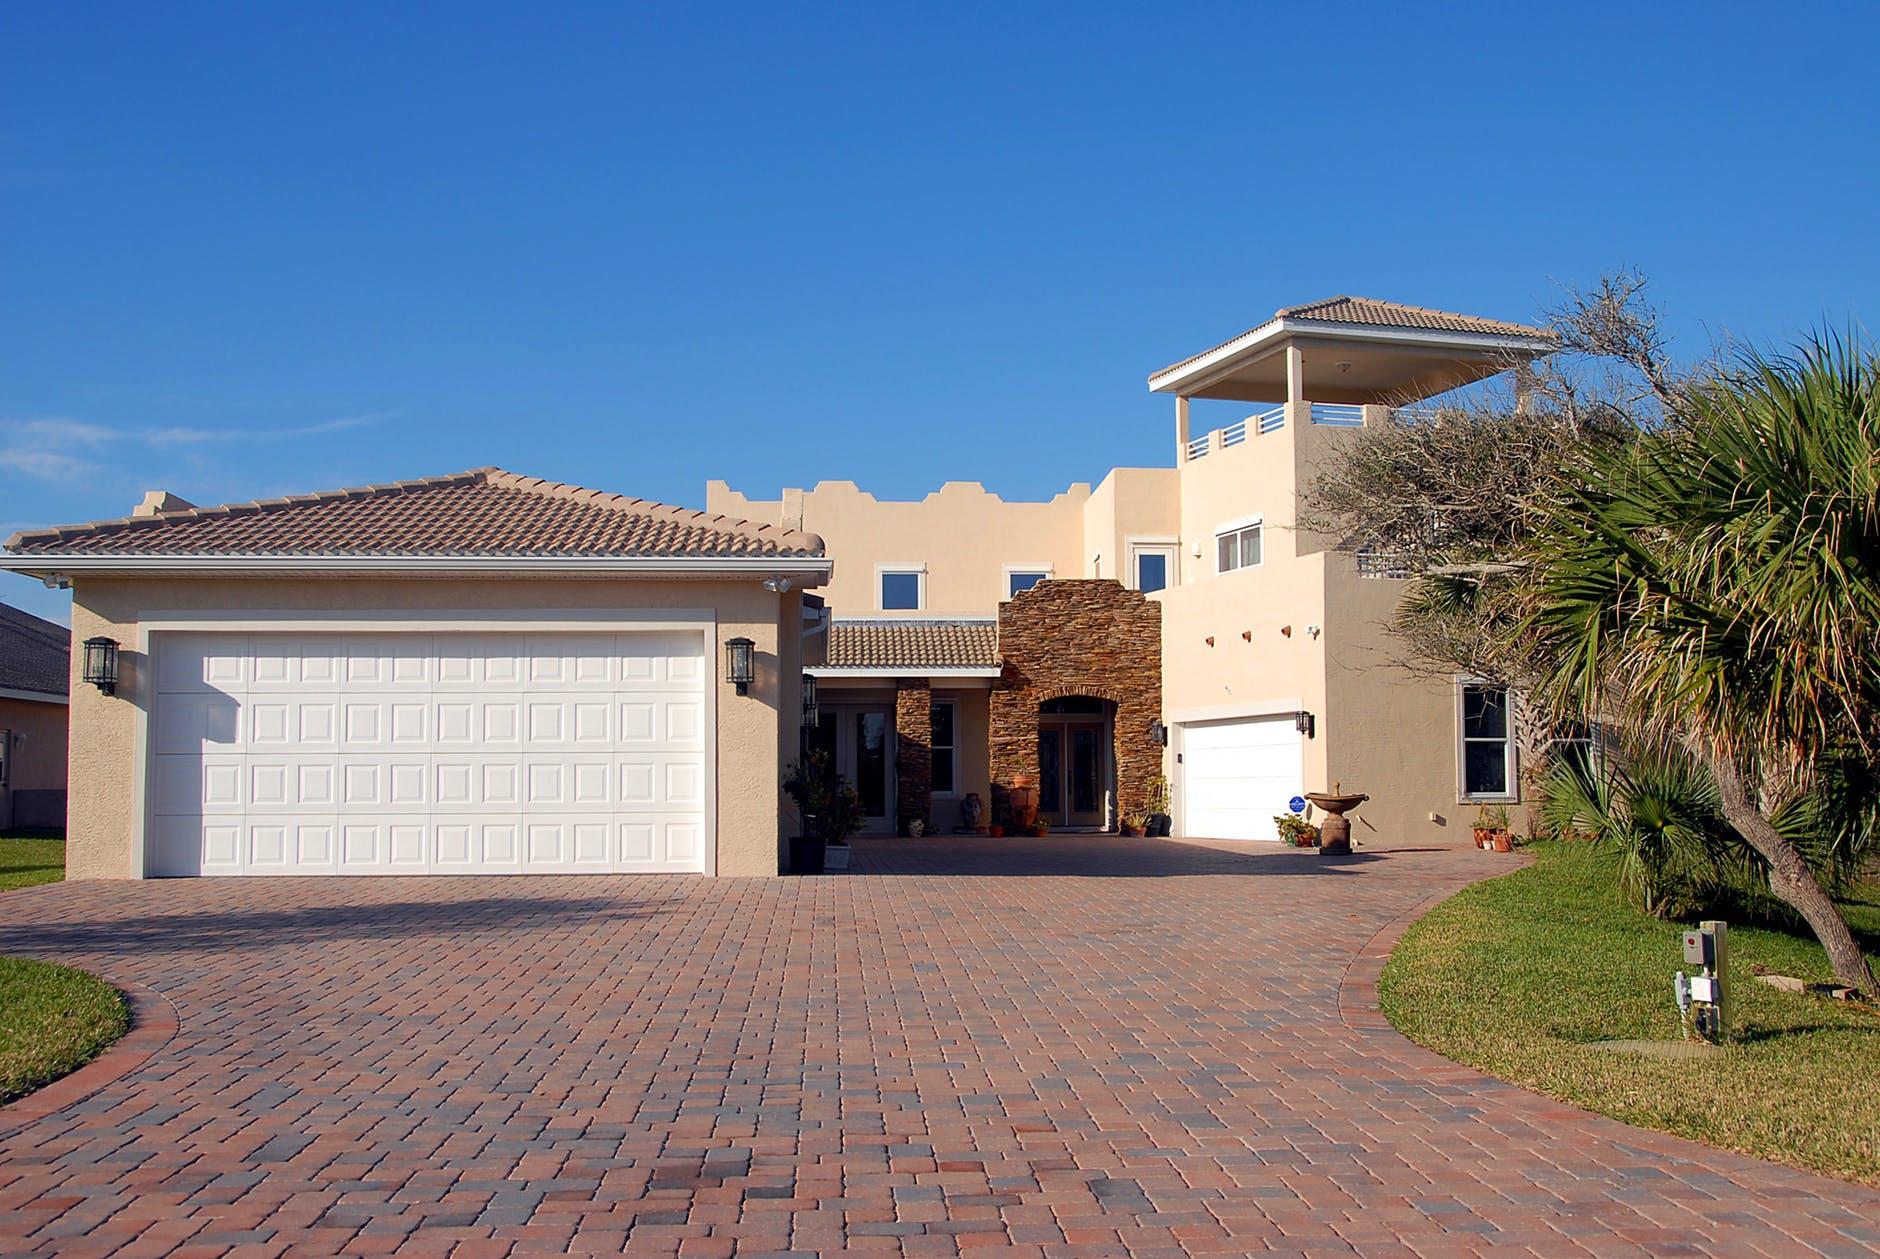 House Exterior Yard Leveling